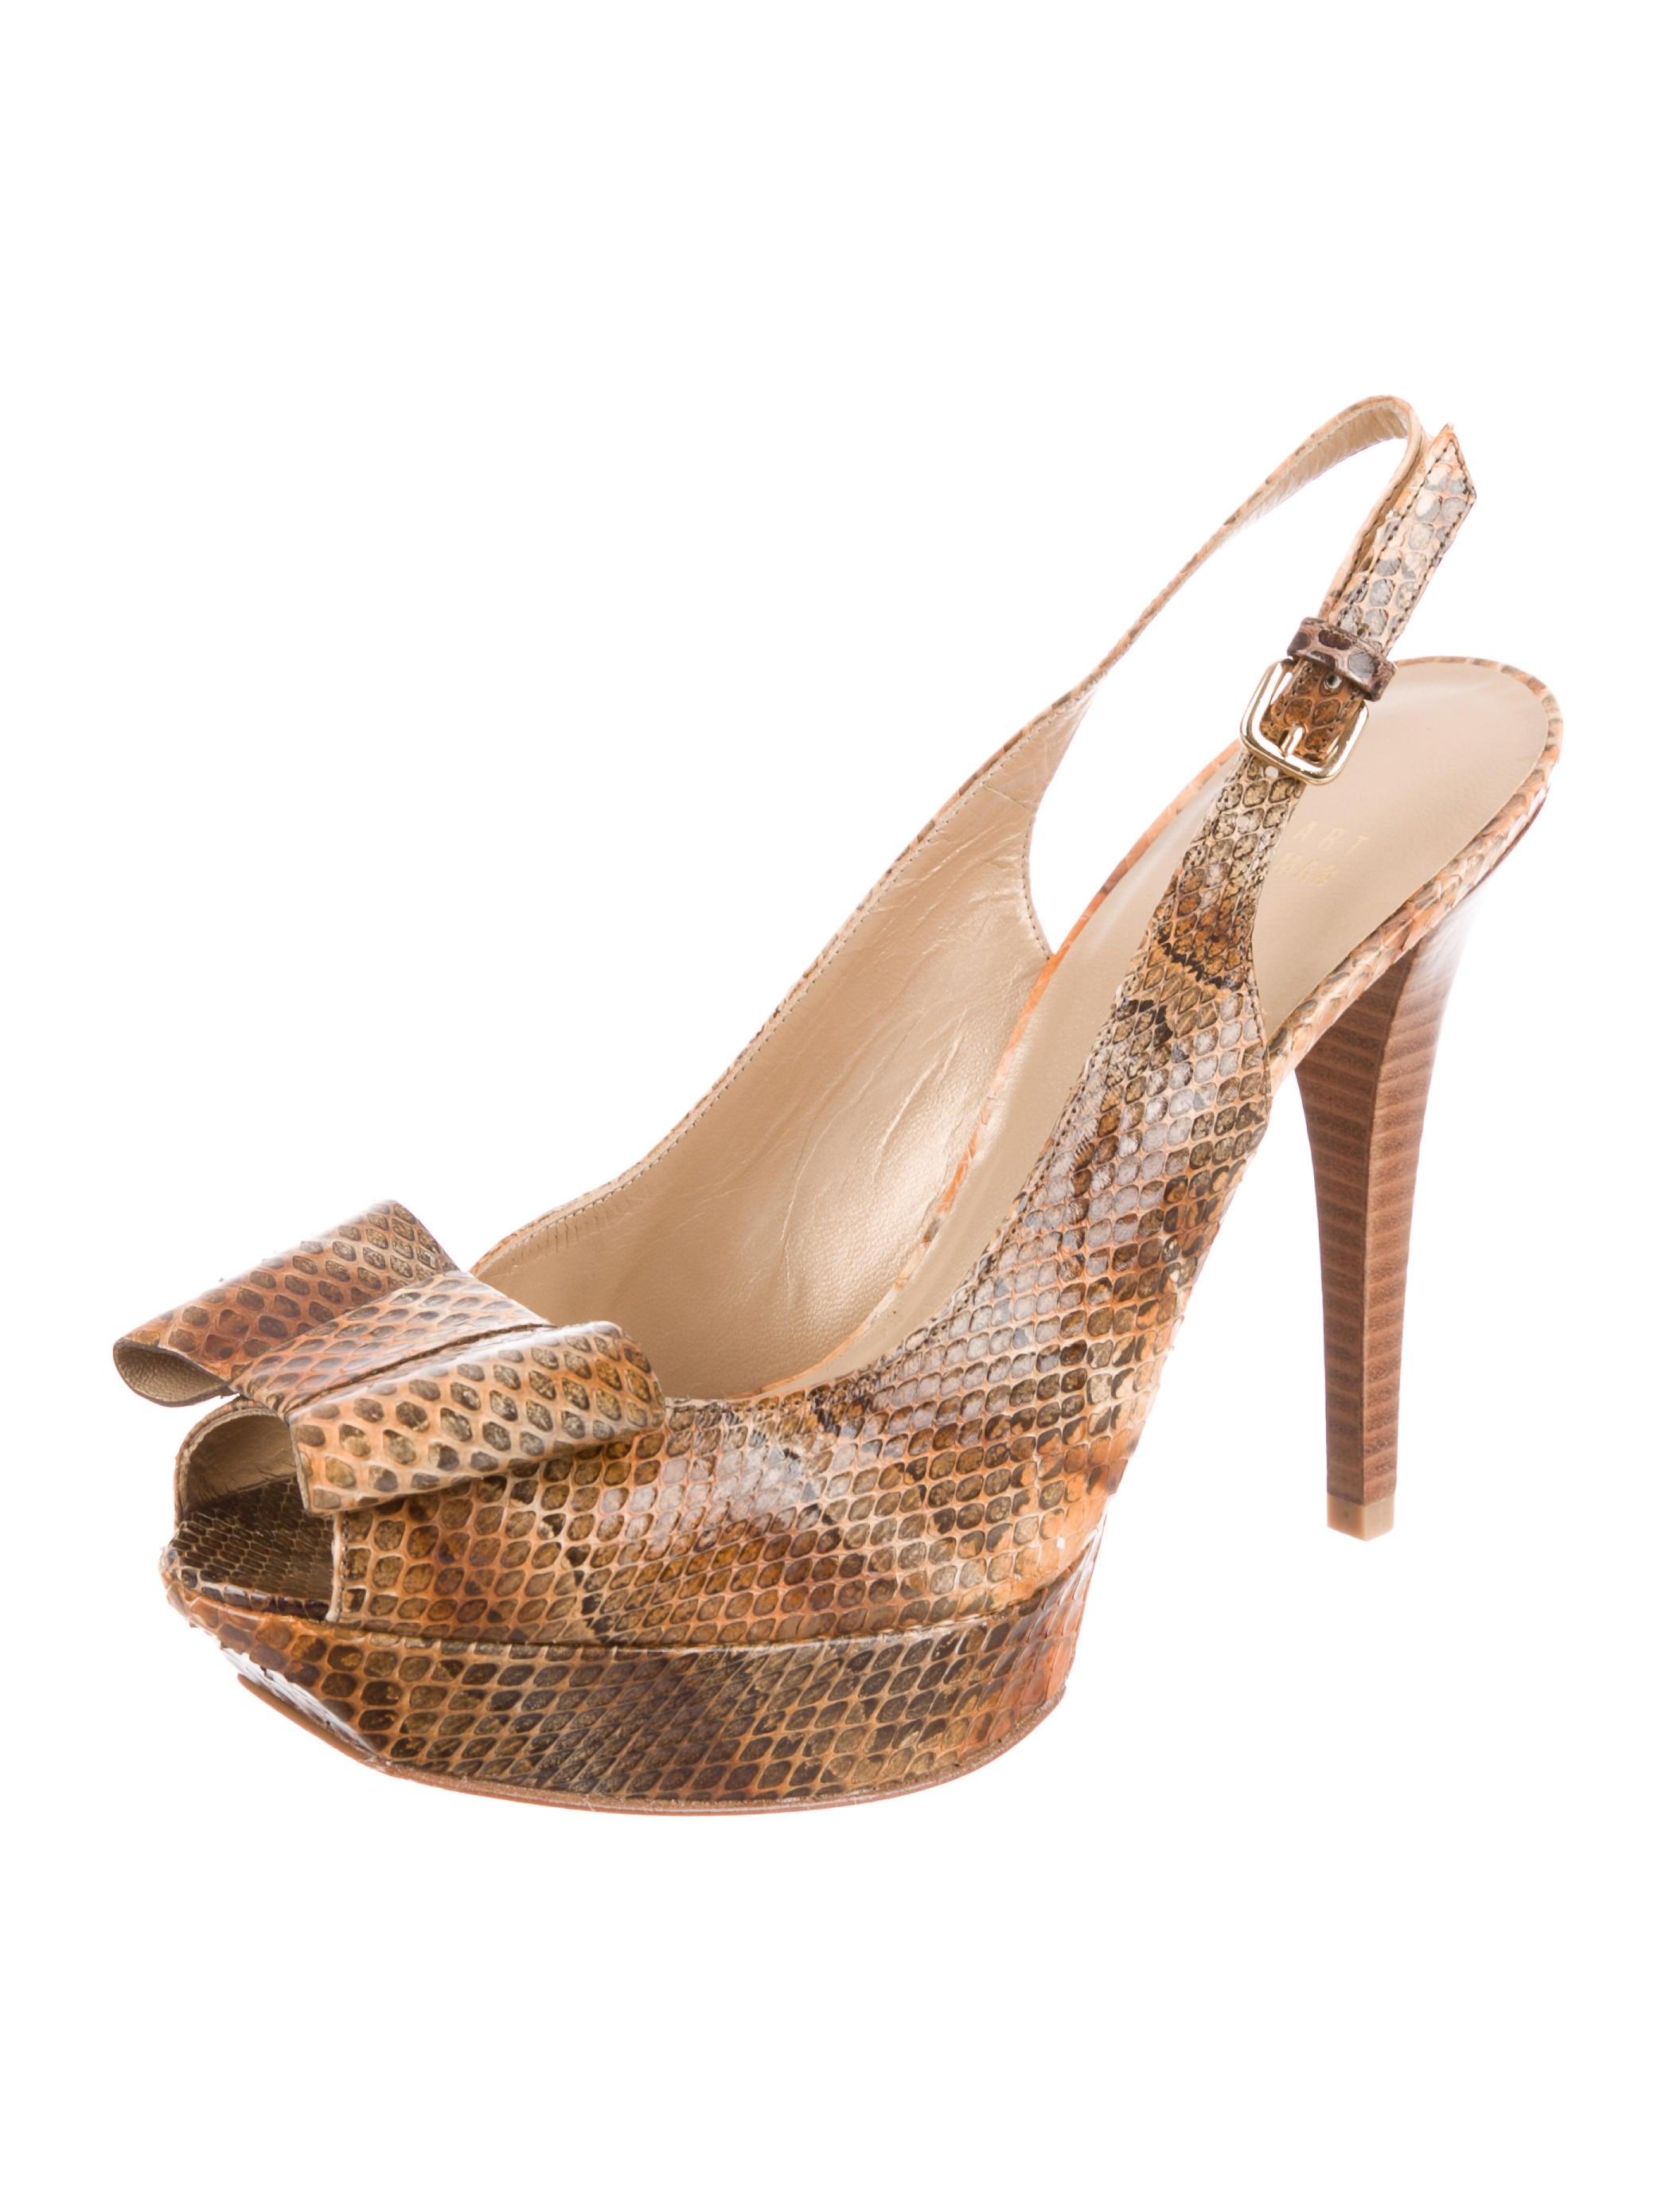 cheap 2014 Stuart Weitzman Bowrey Snakeskin Pumps w/ Tags online store outlet footlocker outlet fake sale explore LvBLBZD